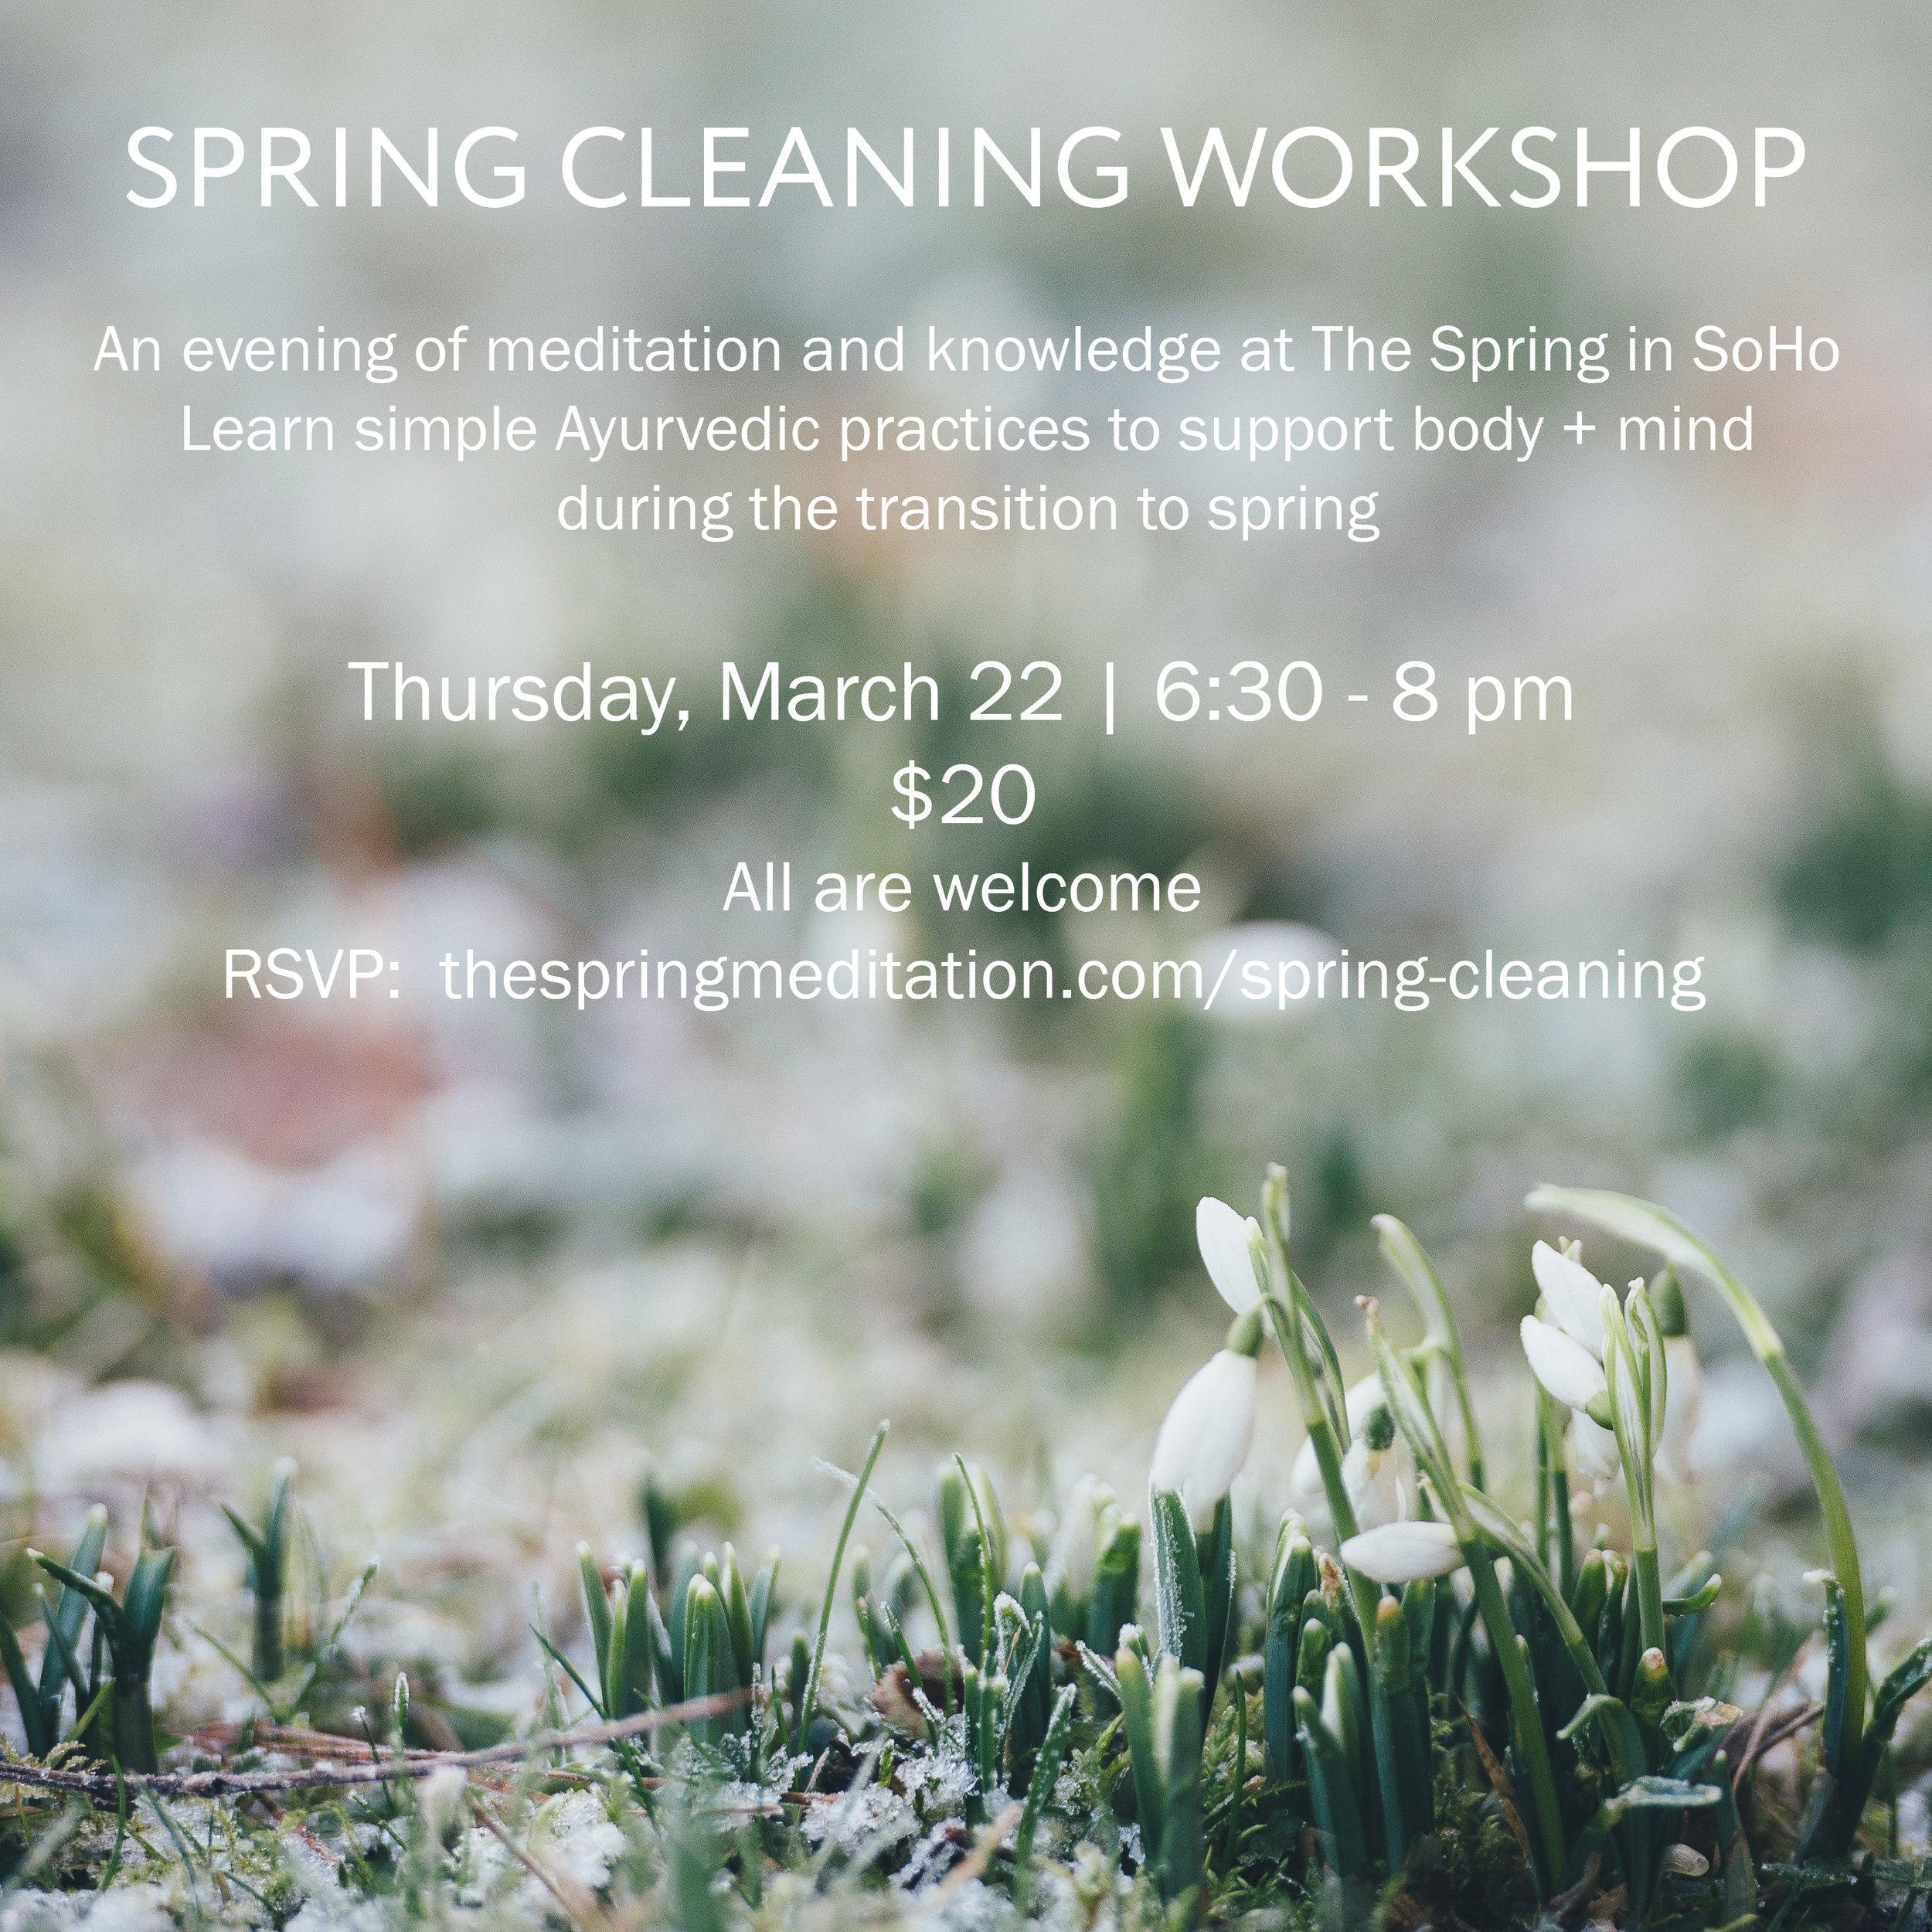 the-spring-meditation-spring-cleaning-ayurveda-event.jpg